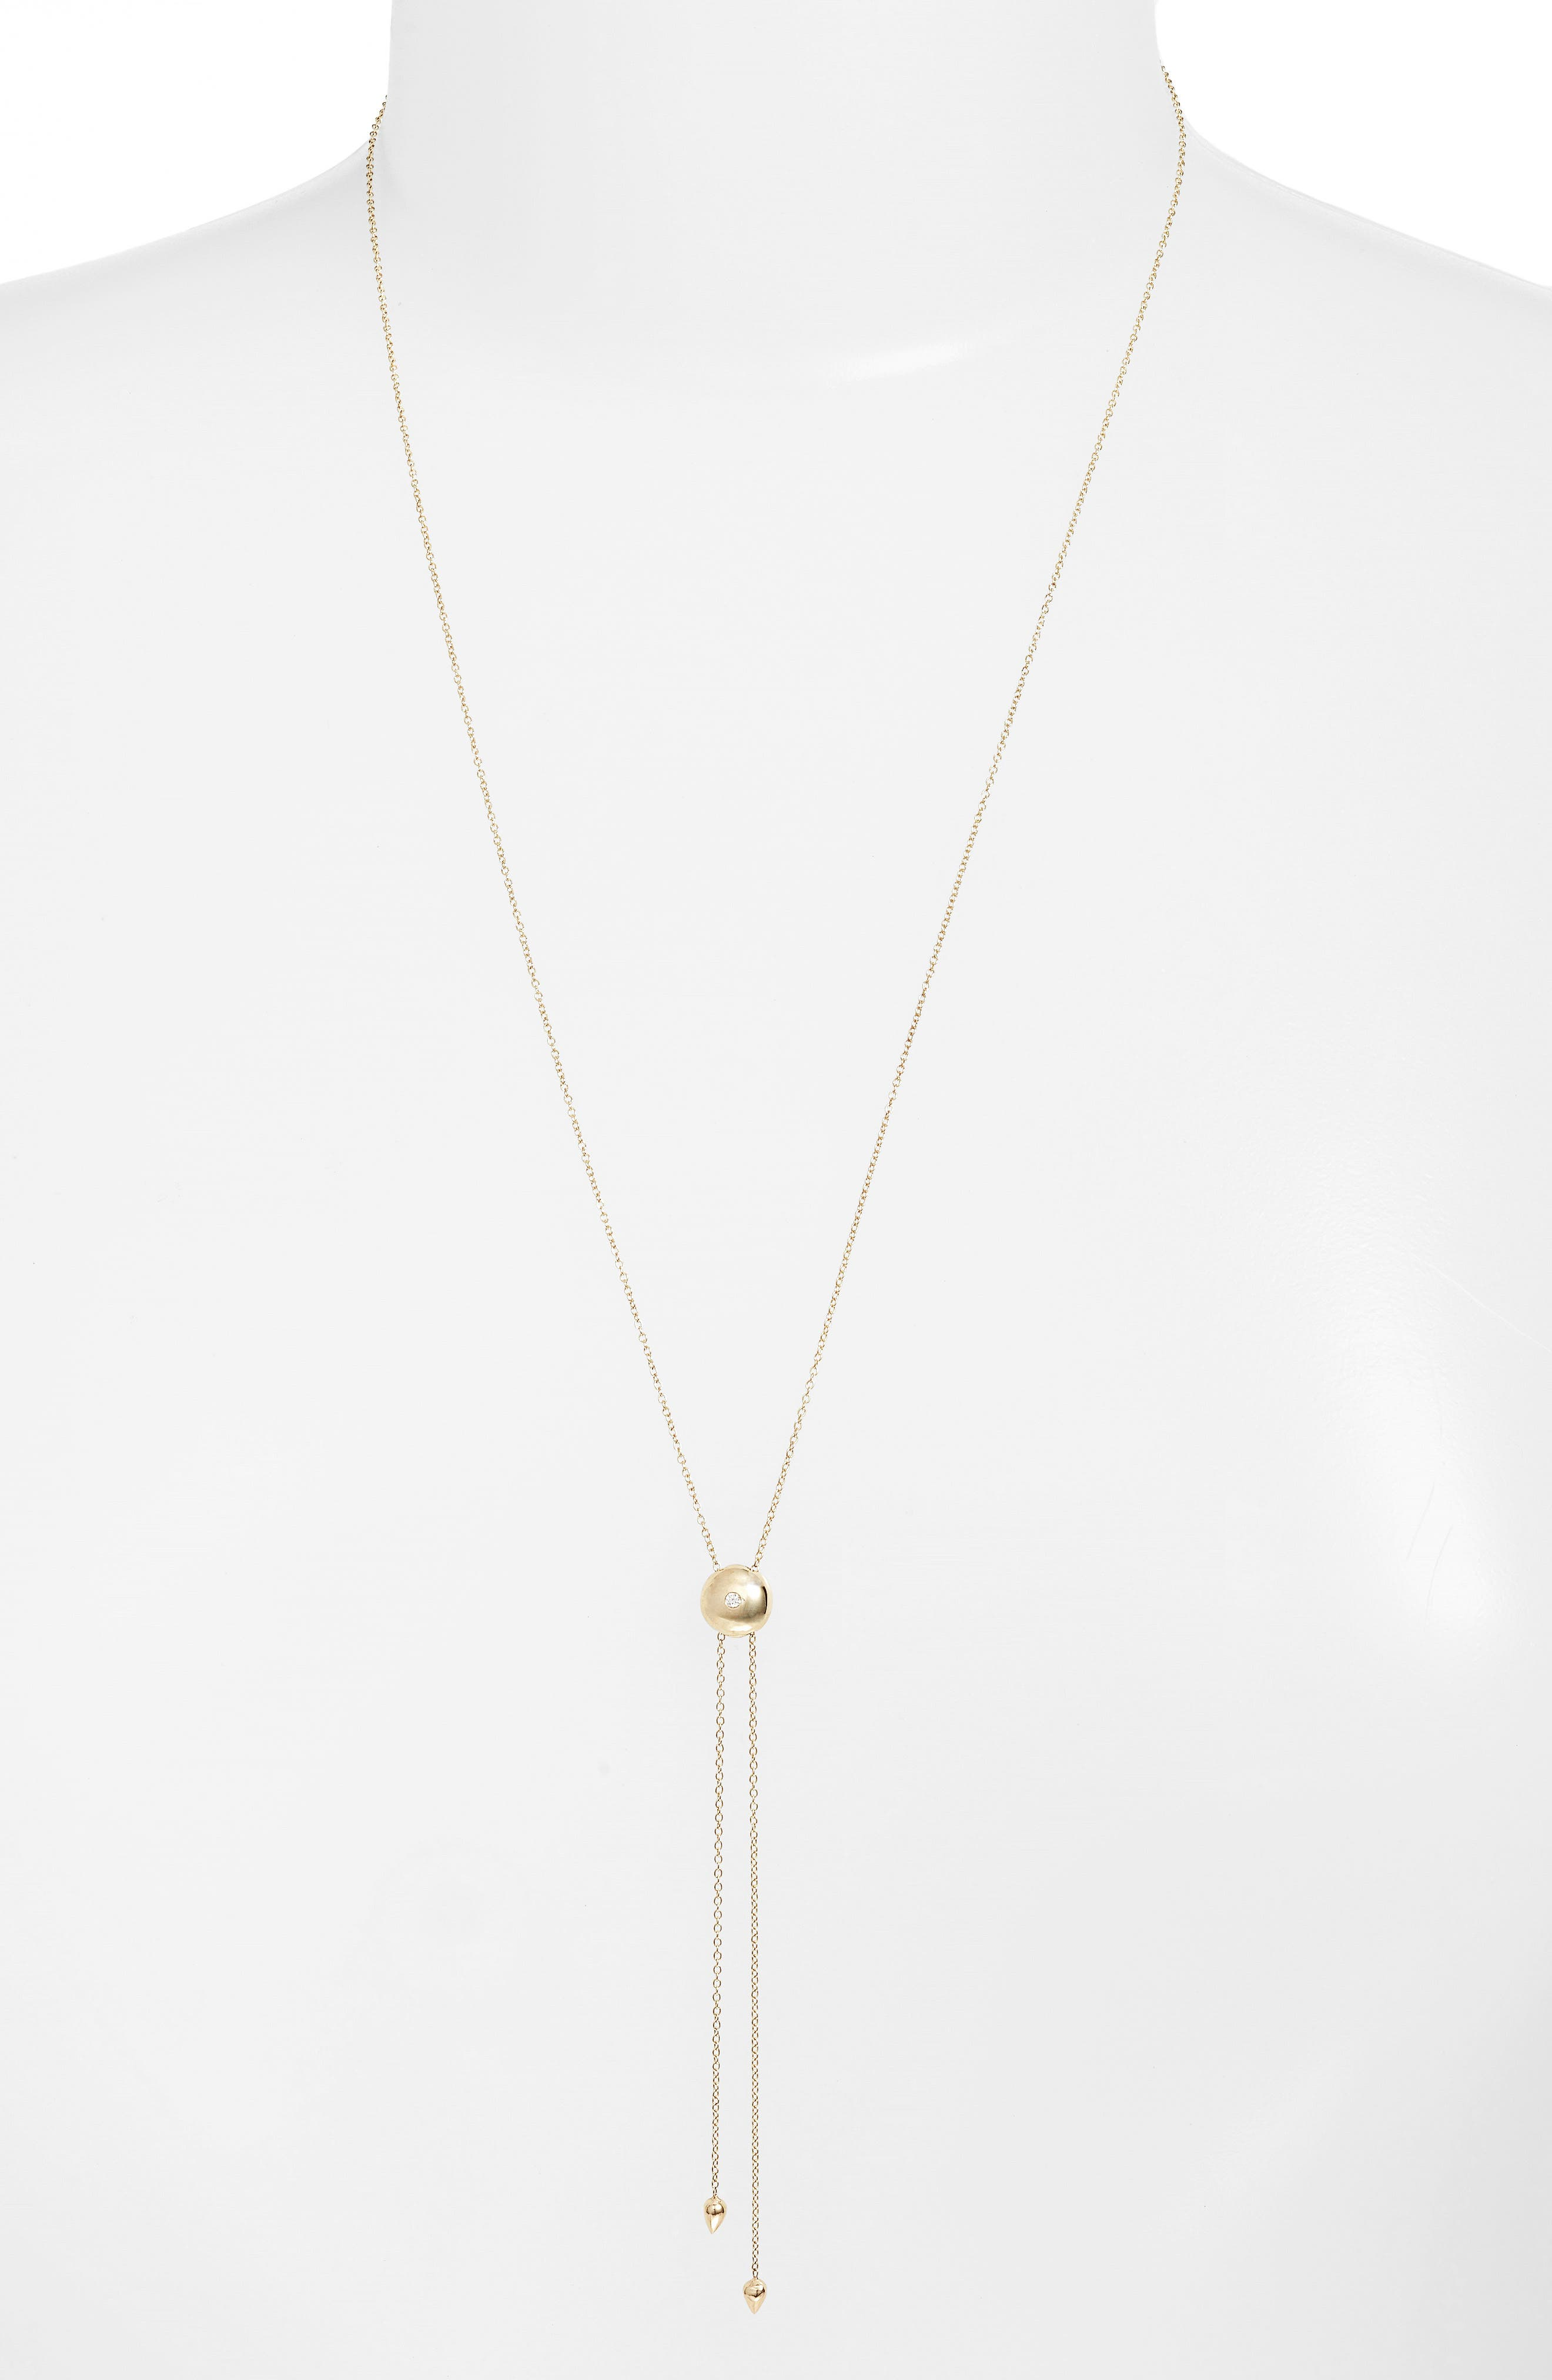 Diamond Lariat Necklace,                             Main thumbnail 1, color,                             Yellow Gold